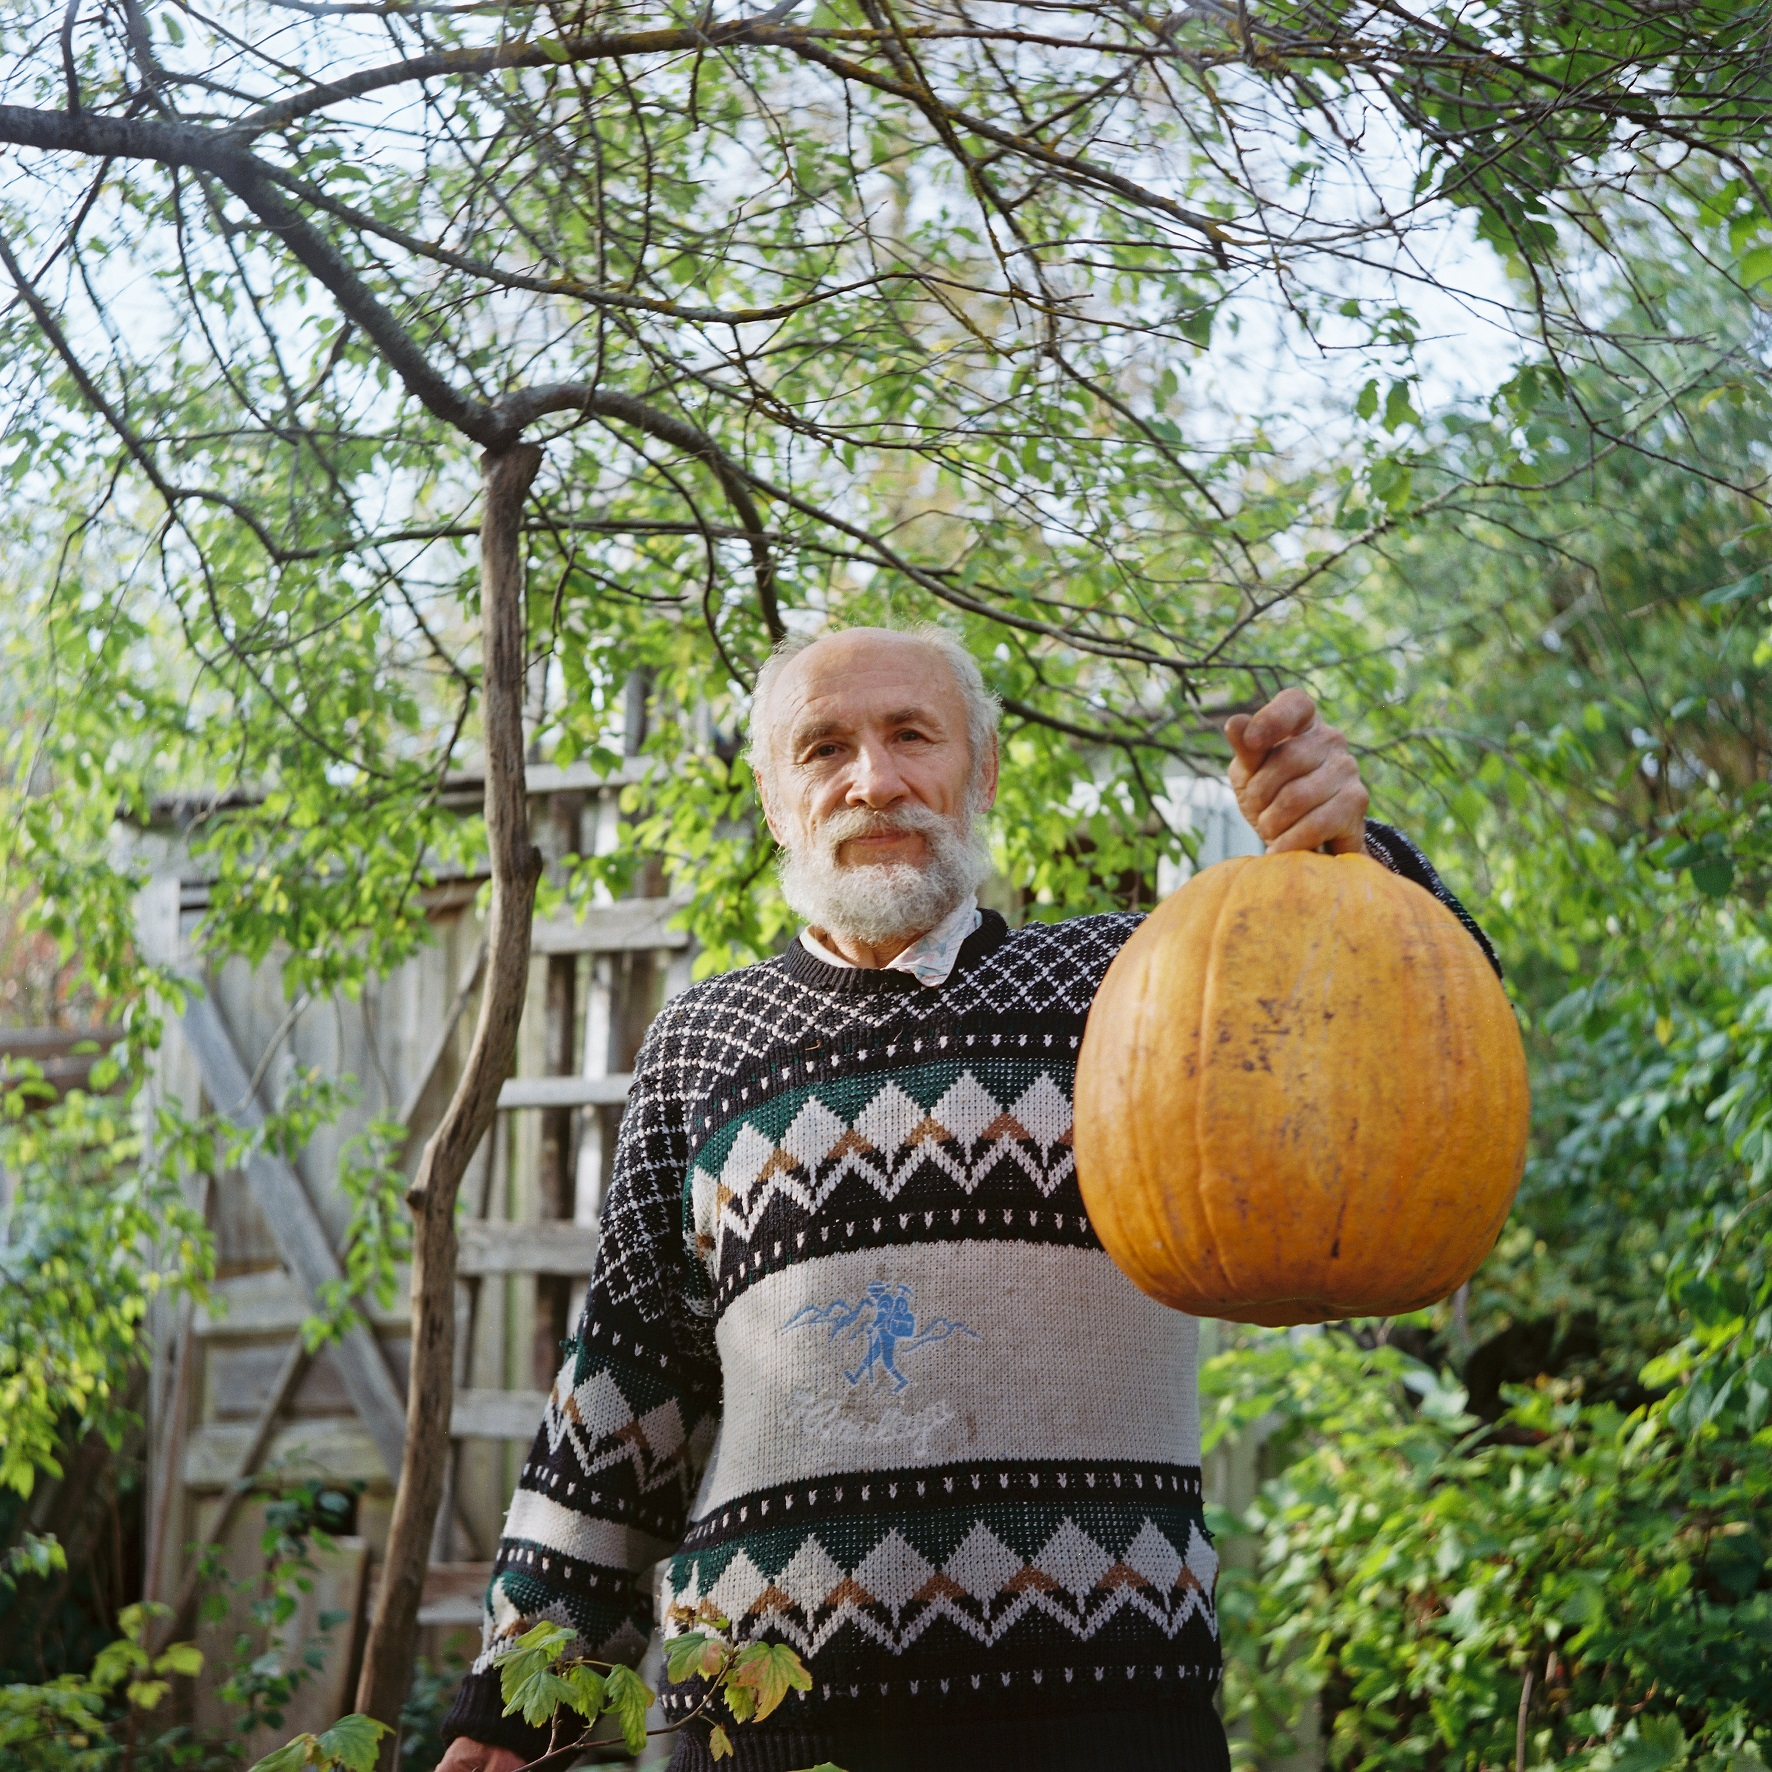 Konstantin, 25.09.2011